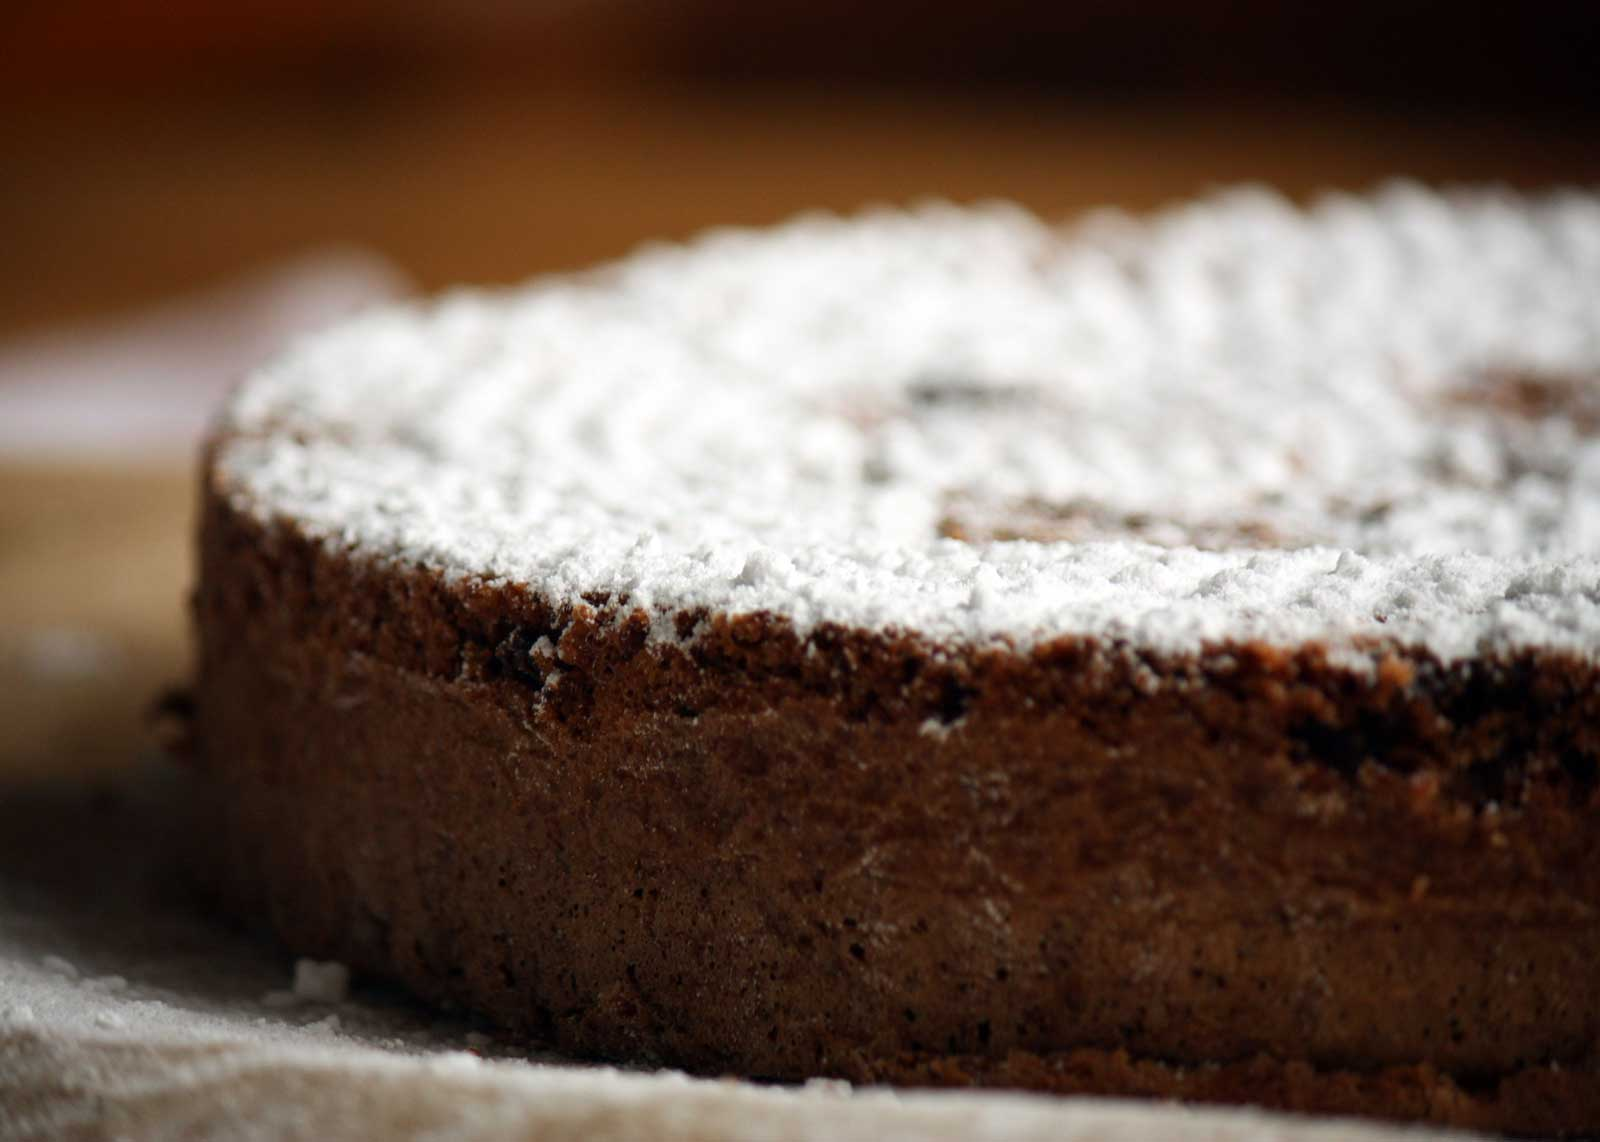 Torta Caprese della Pasticceria Martesana